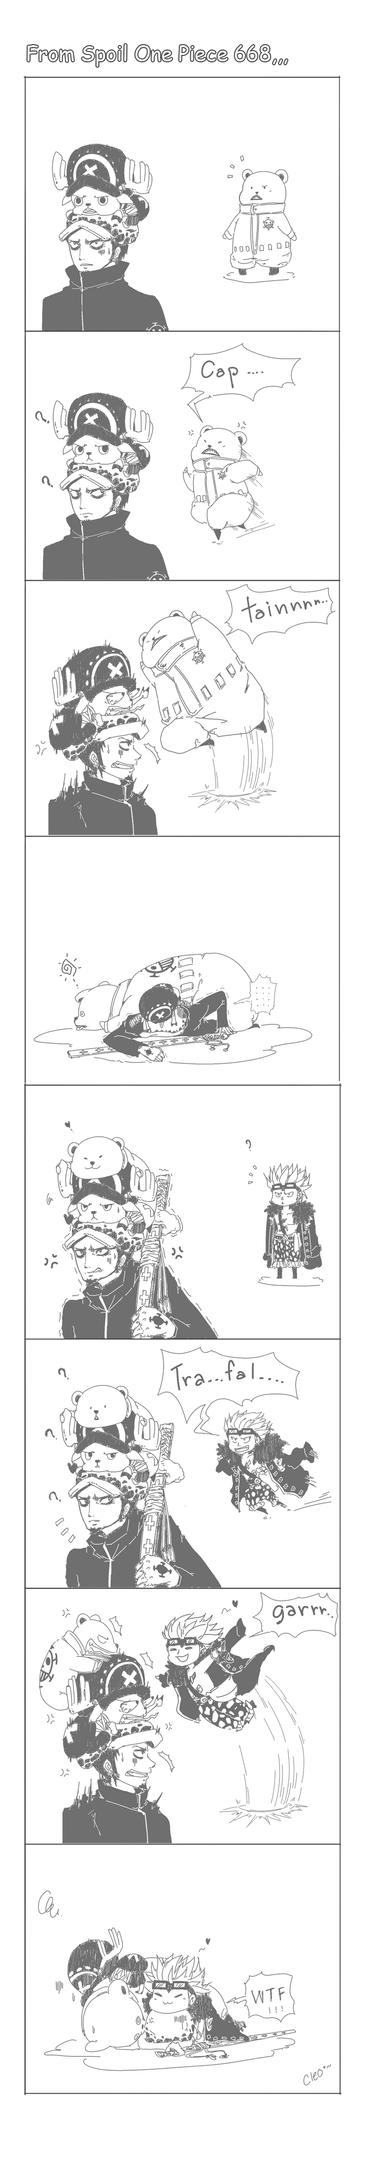 Law - On head by youkokurama1